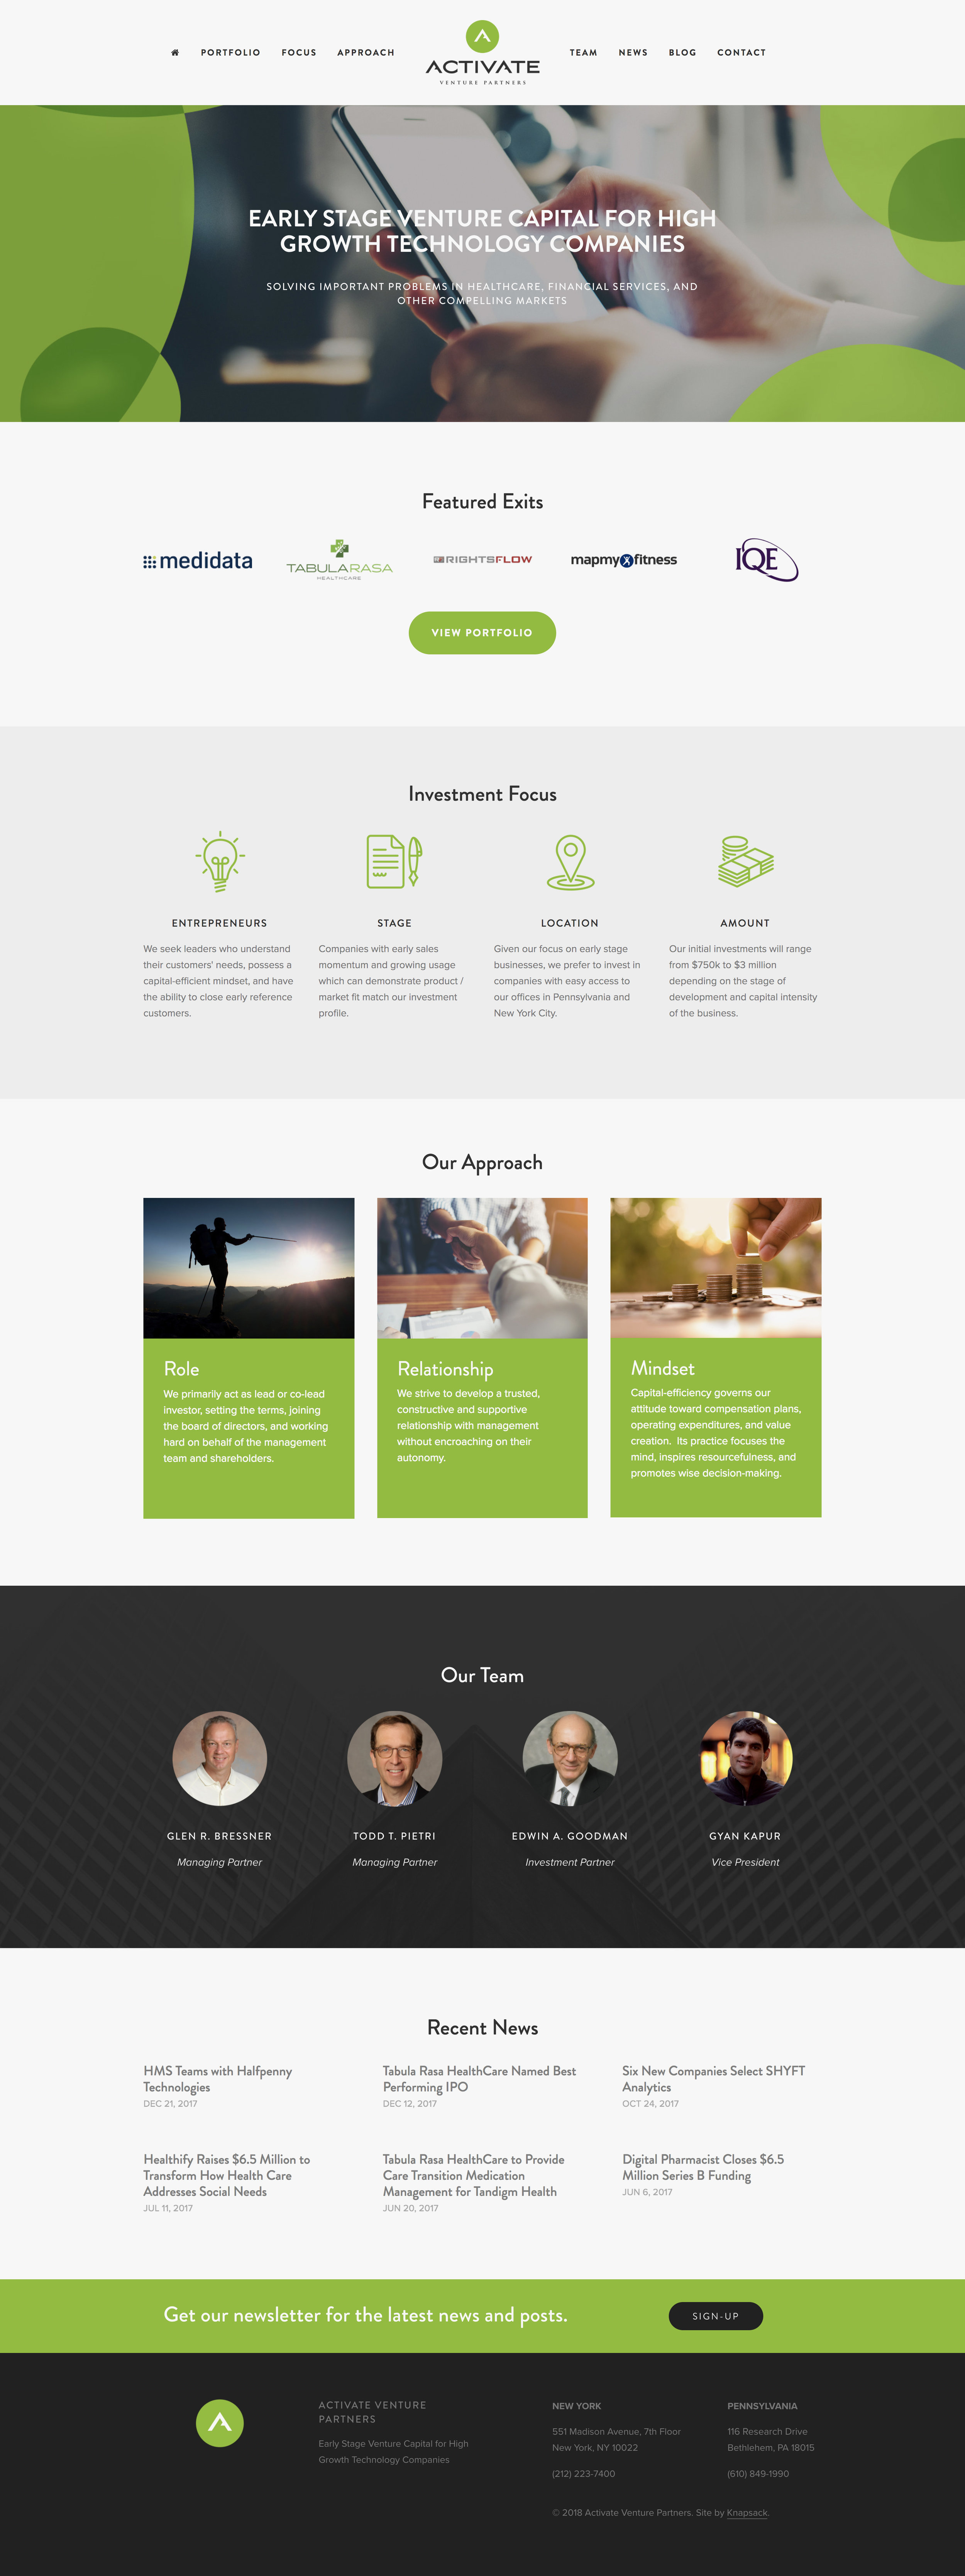 Activate-Venture-Partners-Home.jpg